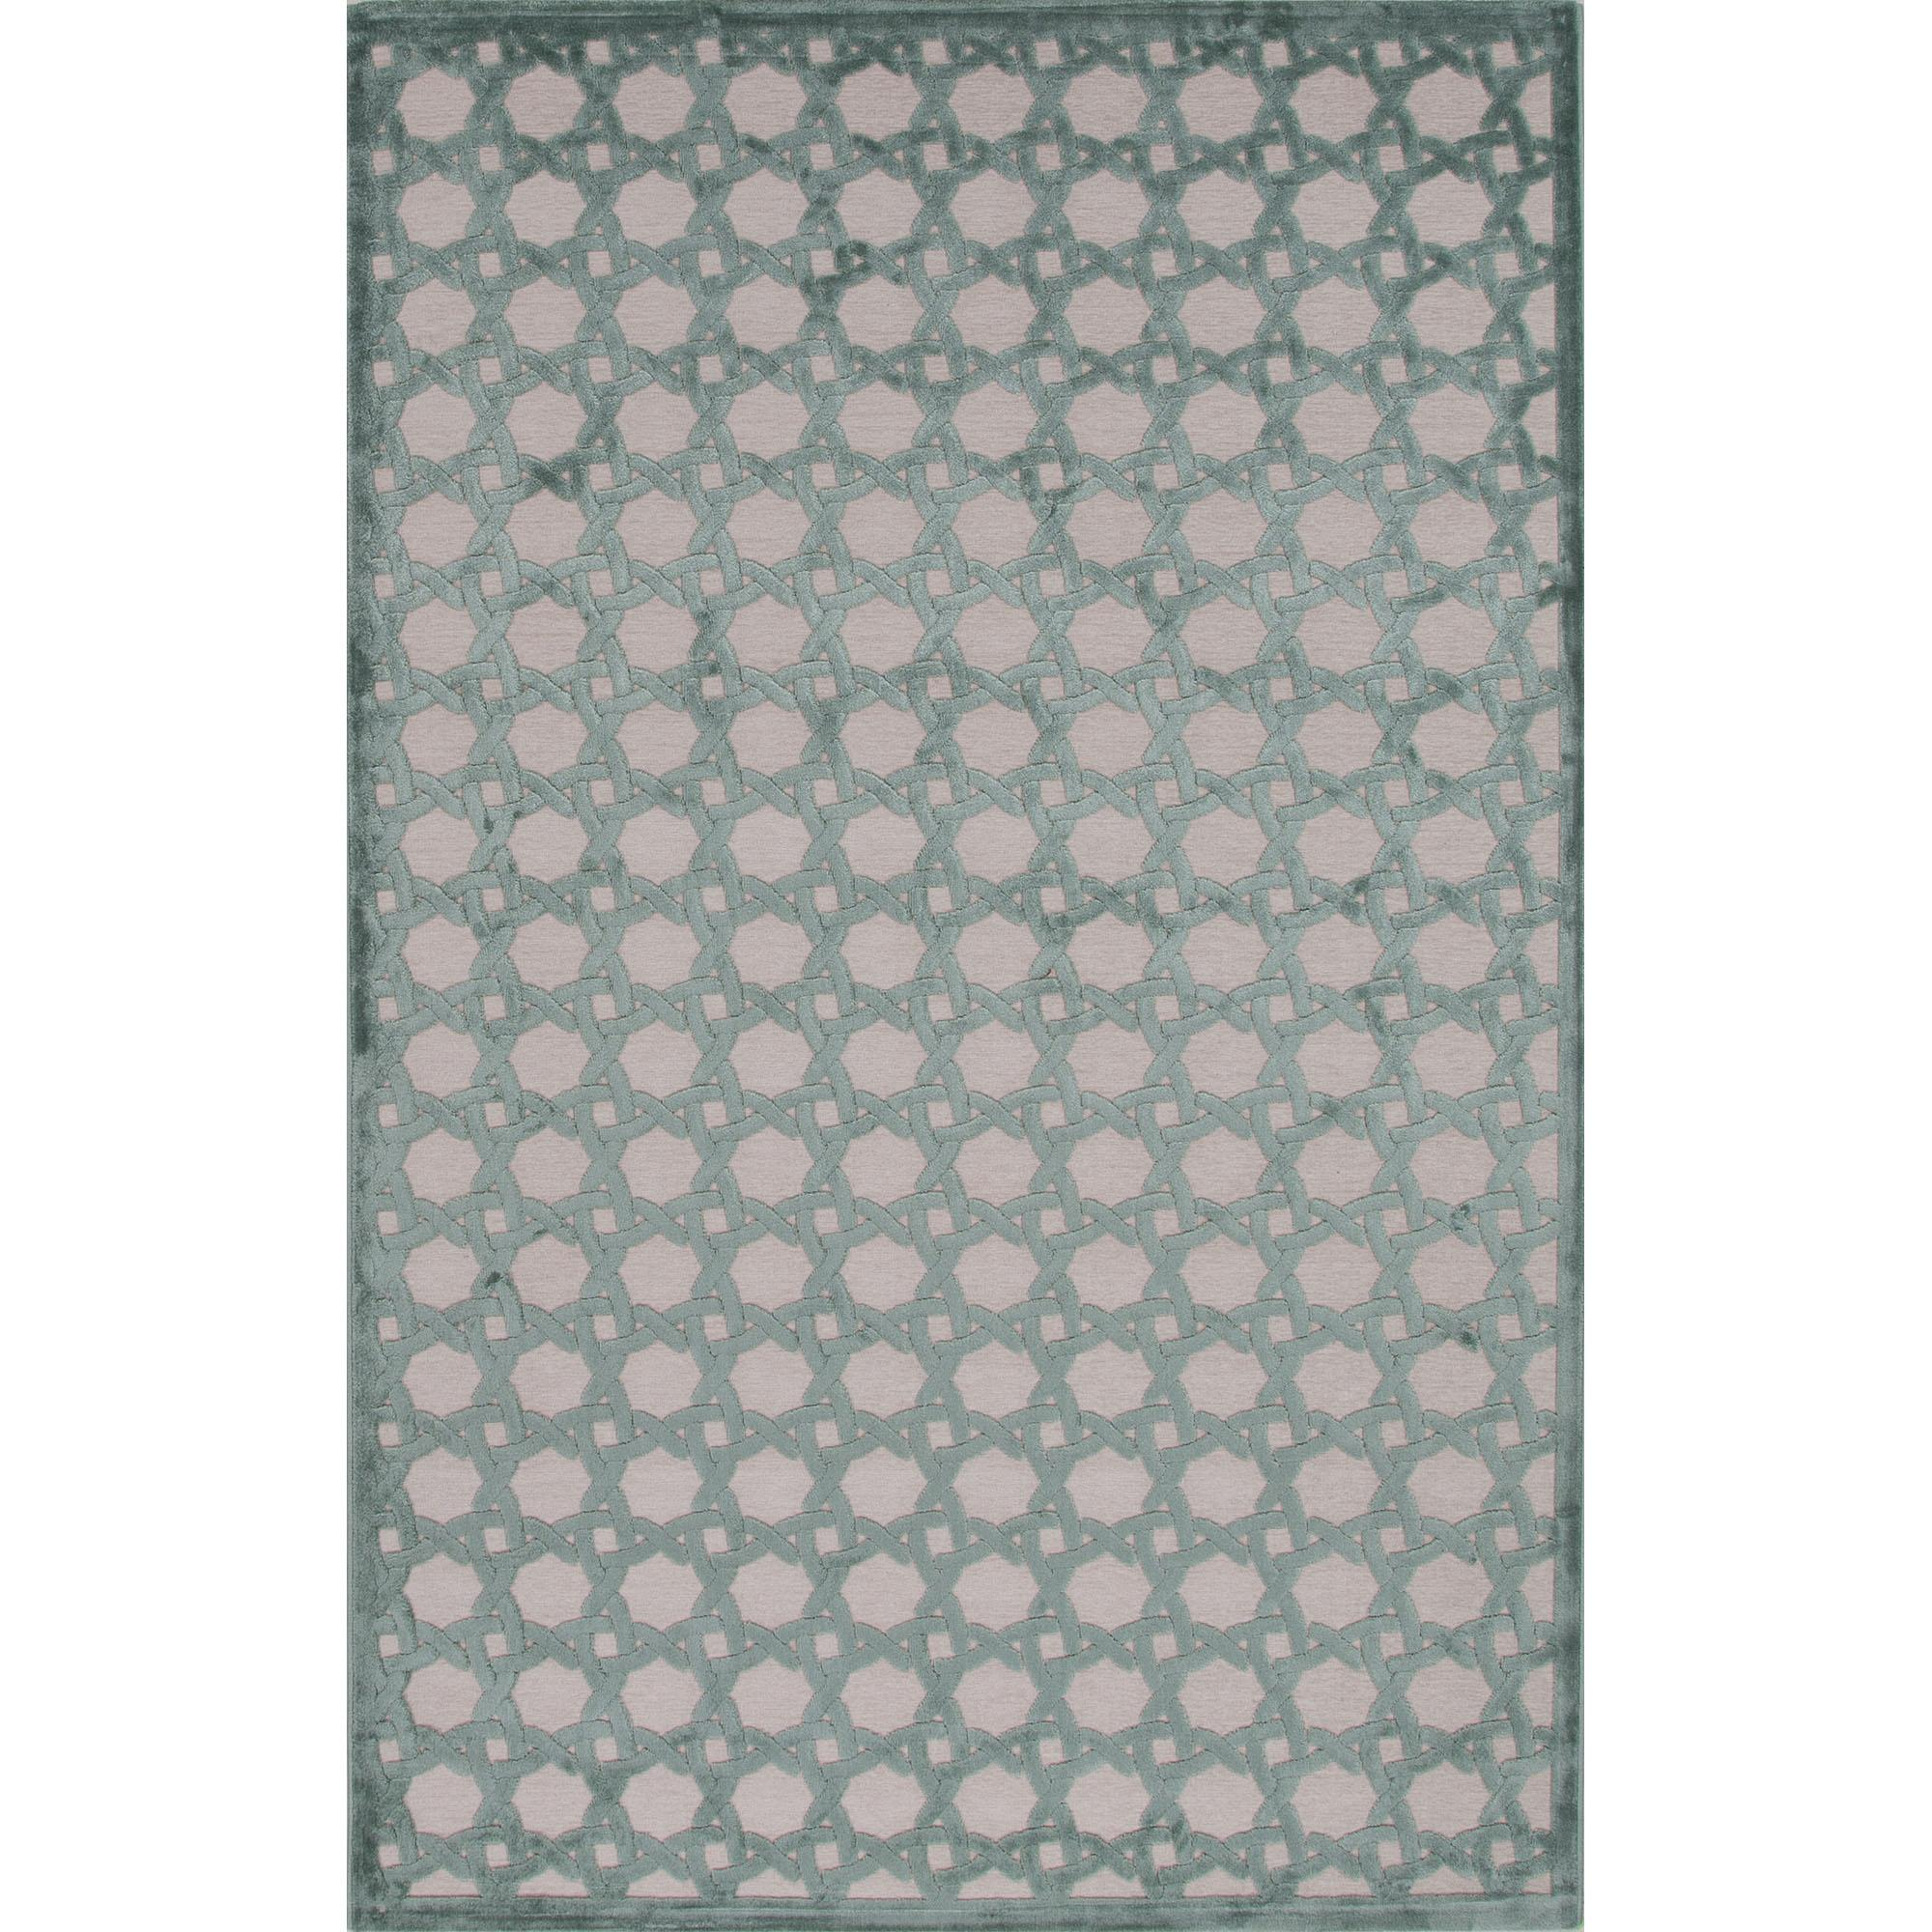 JAIPUR Rugs Fables 7.6 x 9.6 Rug - Item Number: RUG121792